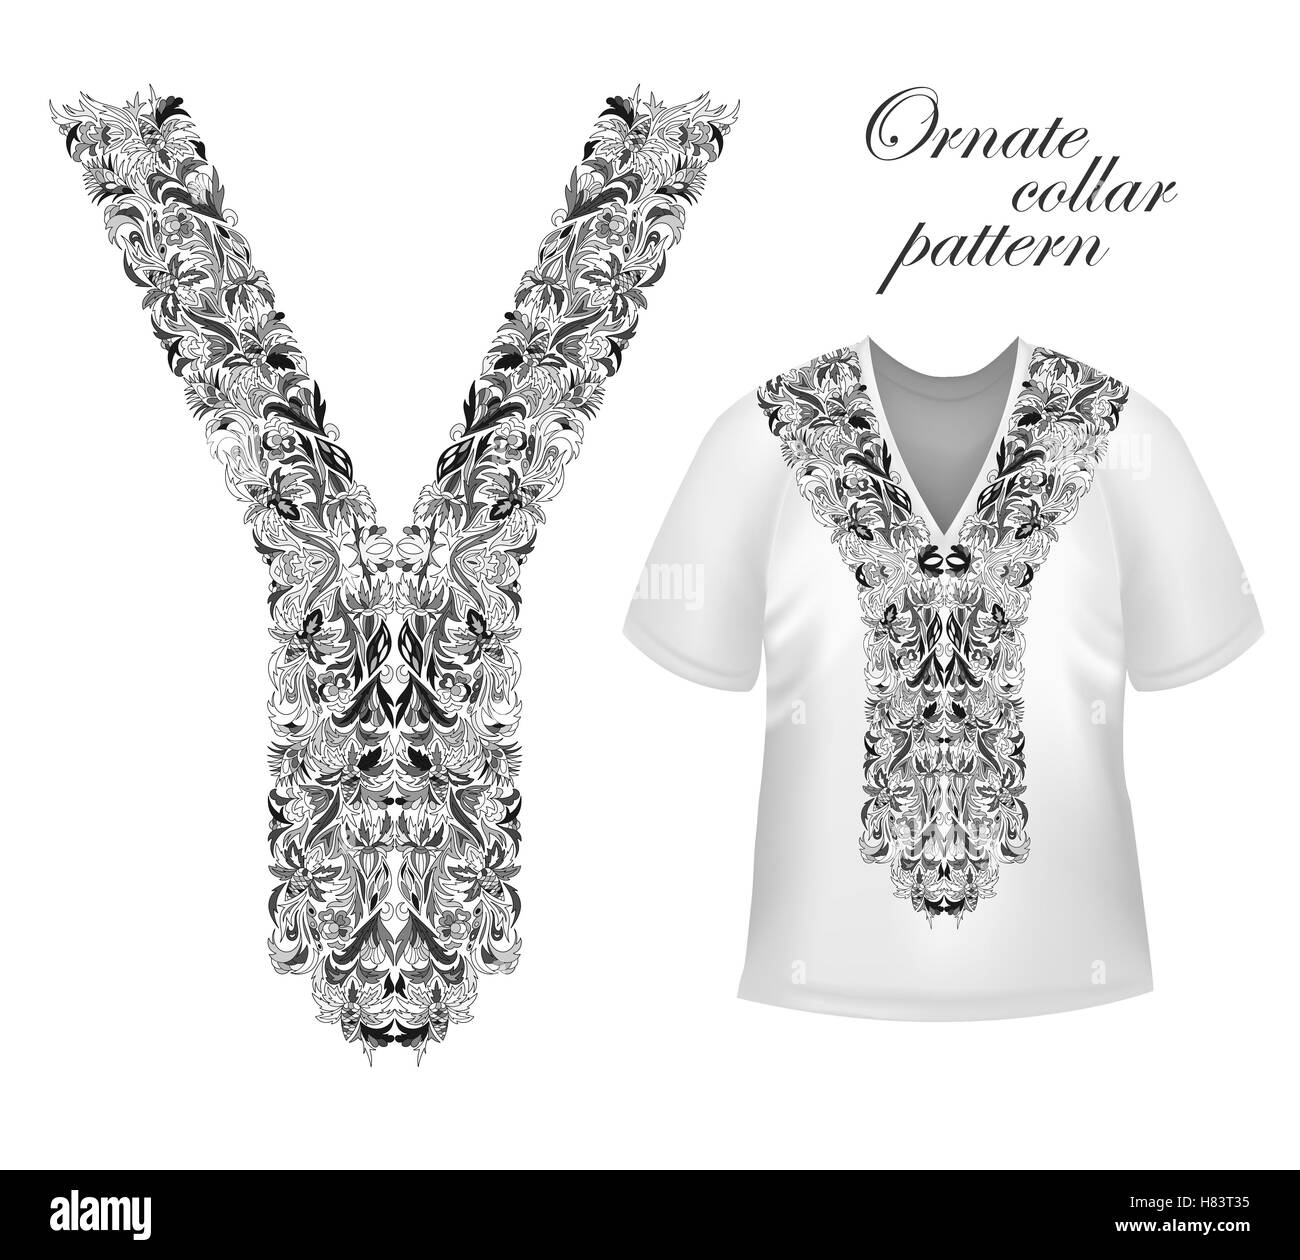 Collar de diseño de camisetas 76f1c77a2d649